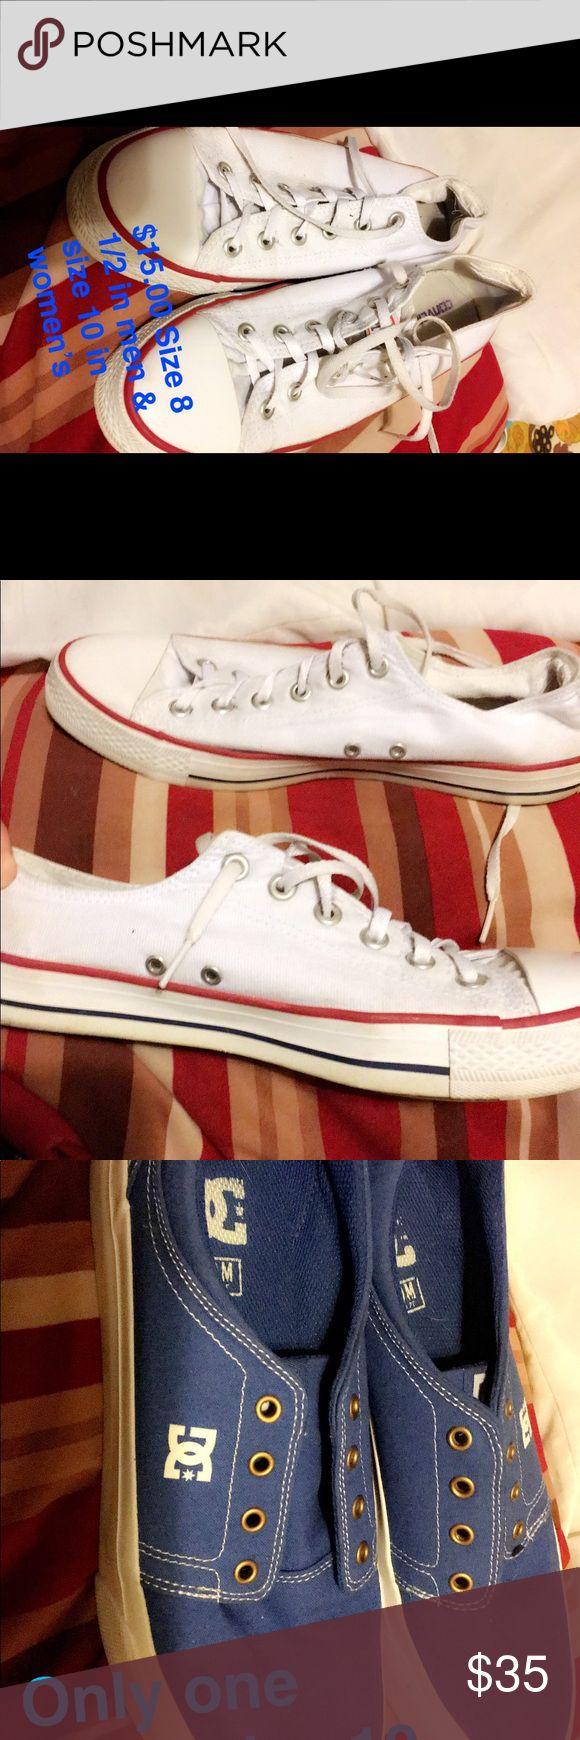 Shoes & Apron Converse shoes size 10 $15.00 Boots size 10 $15.00 Blue DC sneakers size 10 $10.00 Blue Polkadotted sneakers size 9 $5.00 Arkansas Razorback Apron $15.00 & Other Stories Shoes Sneakers